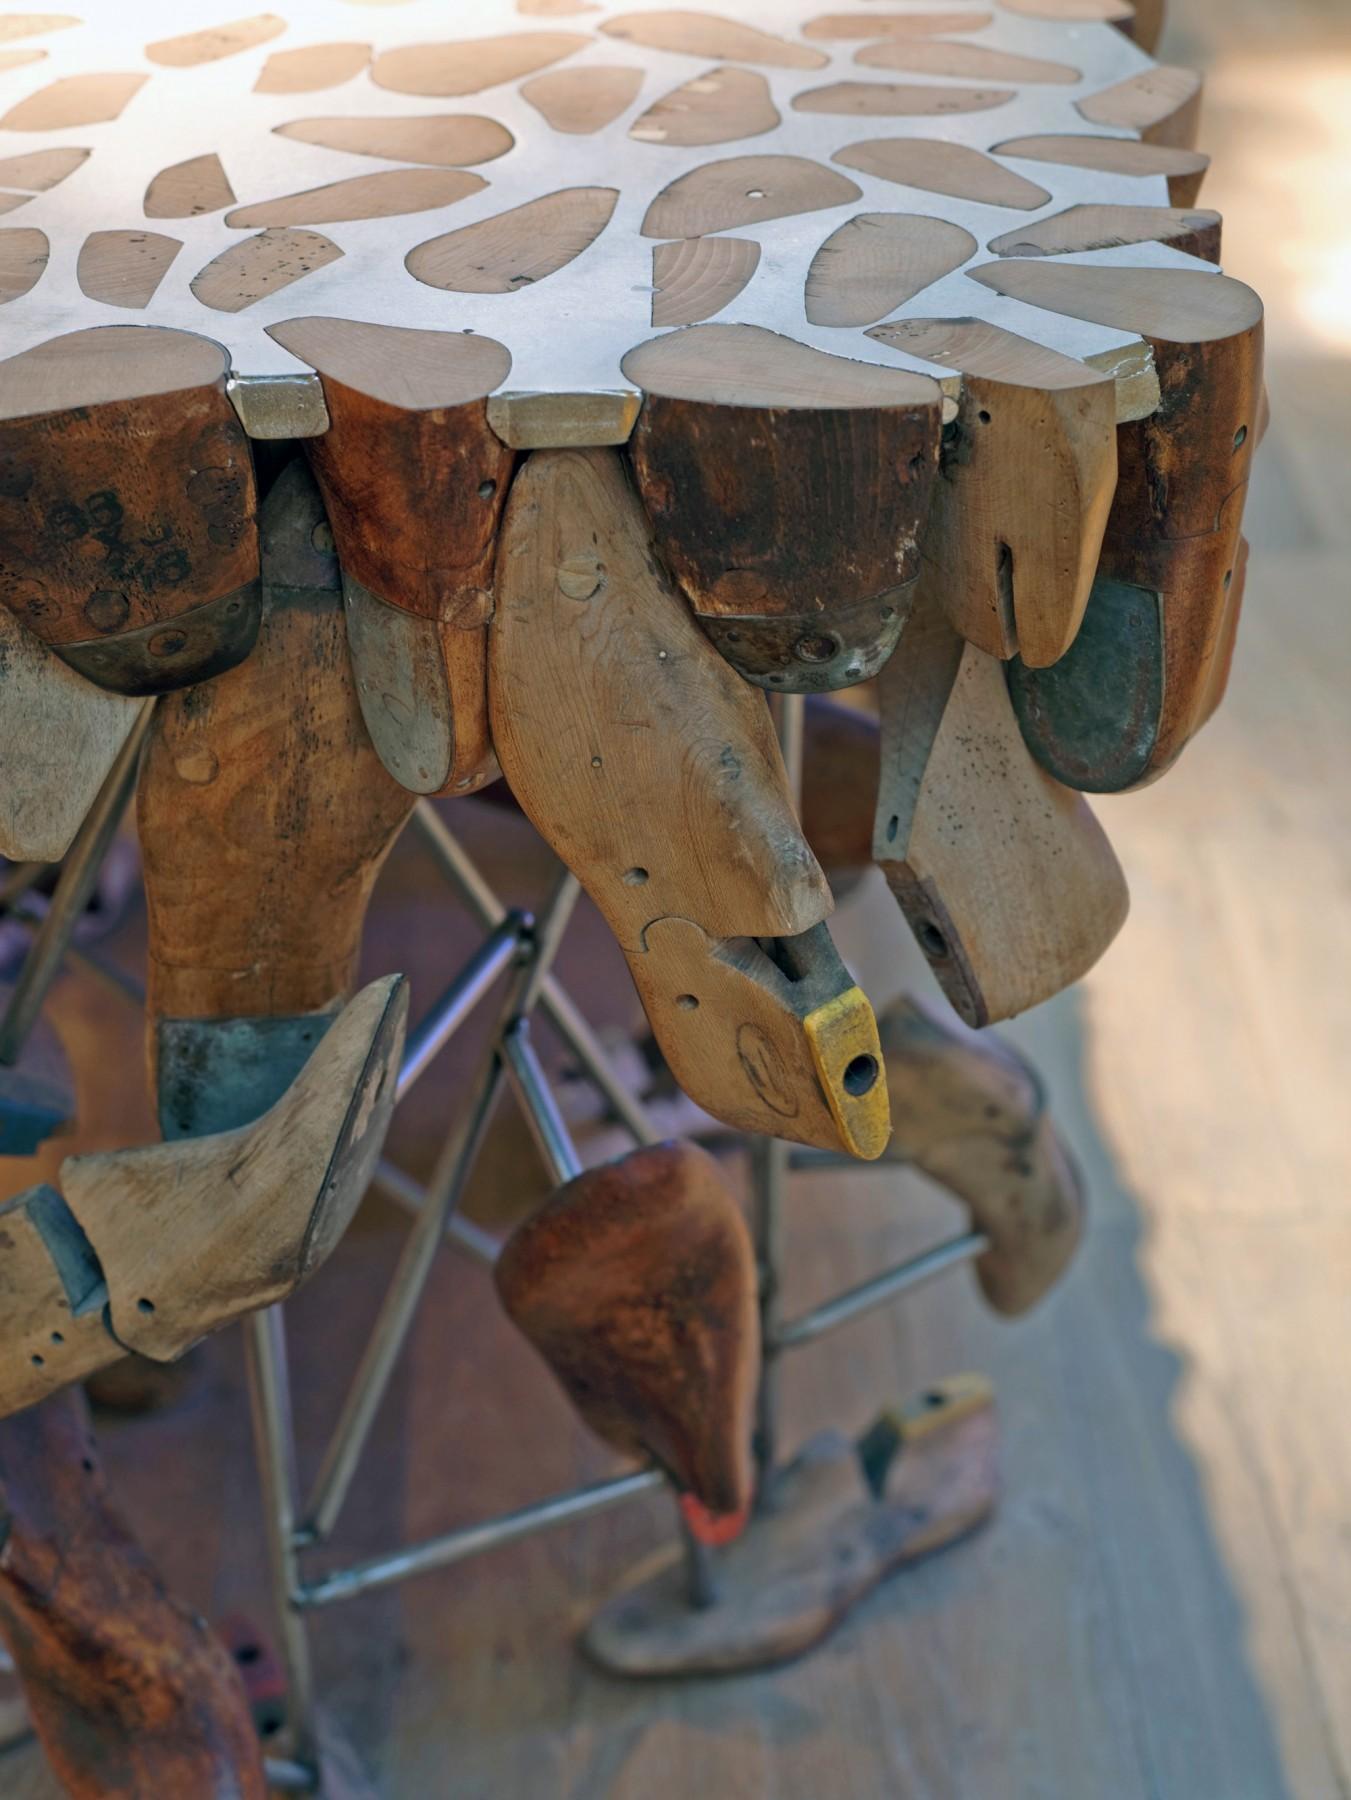 Selfridges-London-designer-fashion-retail-Jamie-Fobert-Architects-shop-shoe-last-table-galleries-4